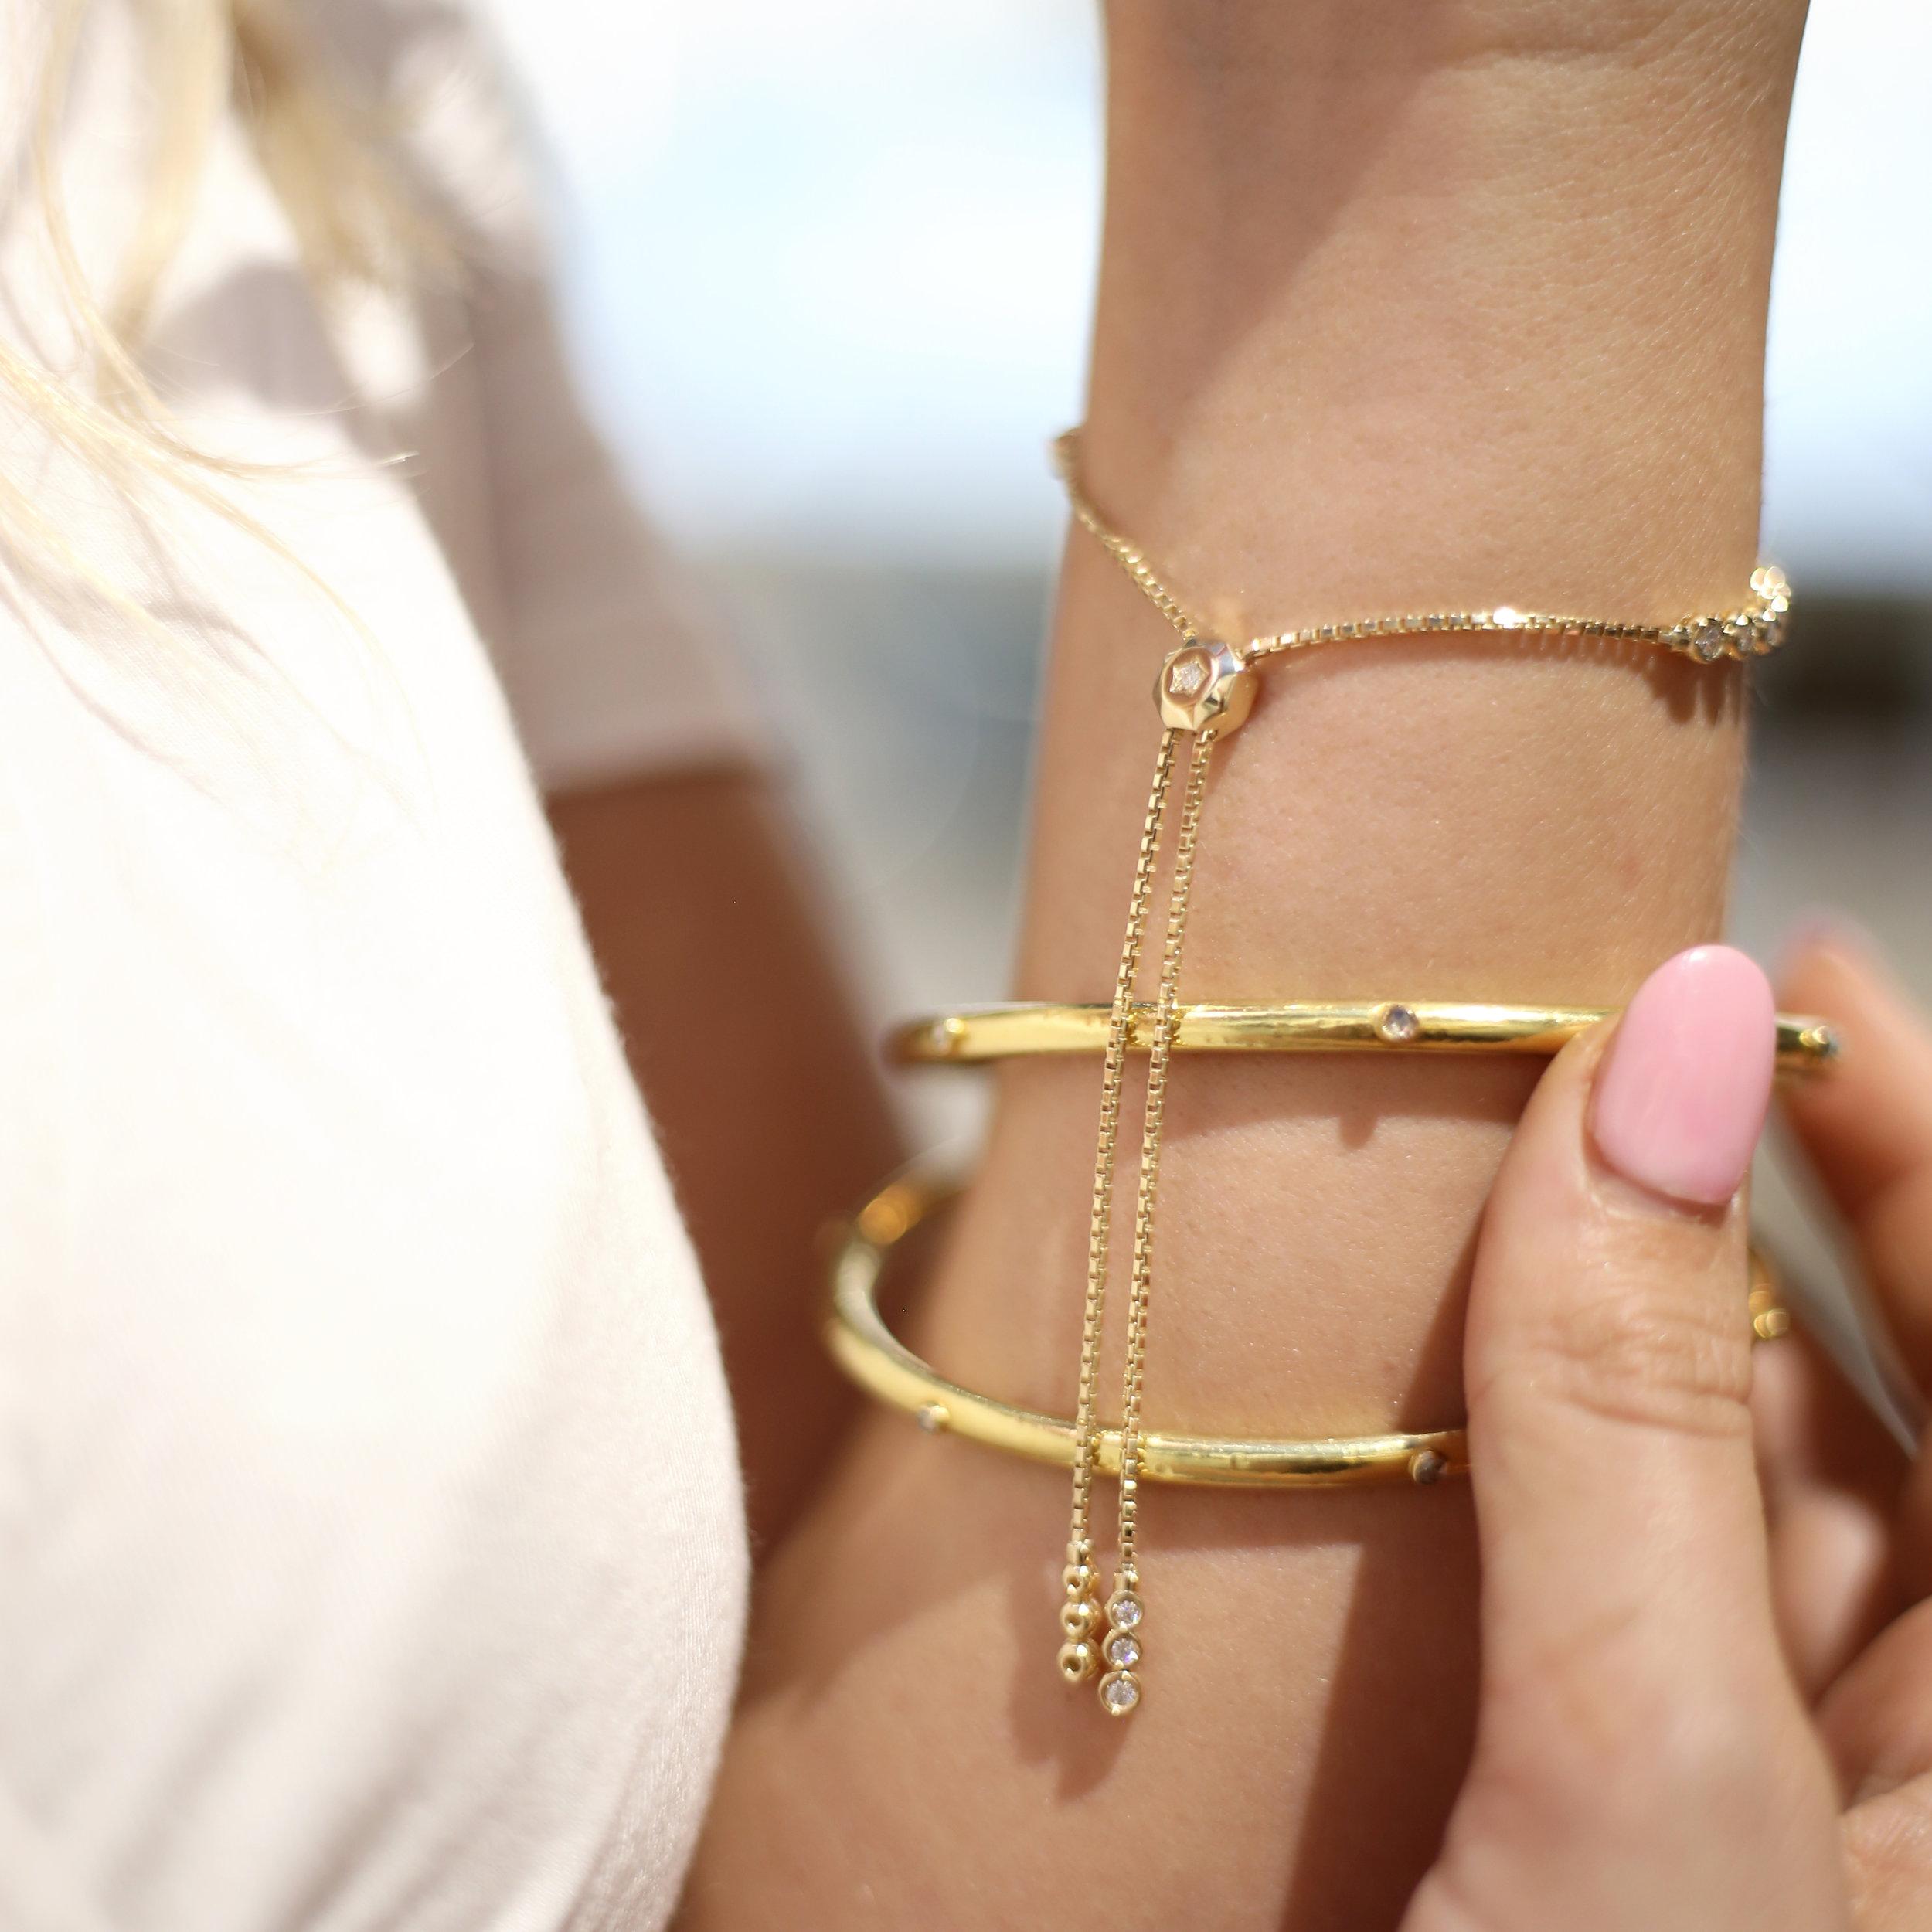 diamond_adjustable_bolo_style_bracelet.jpg